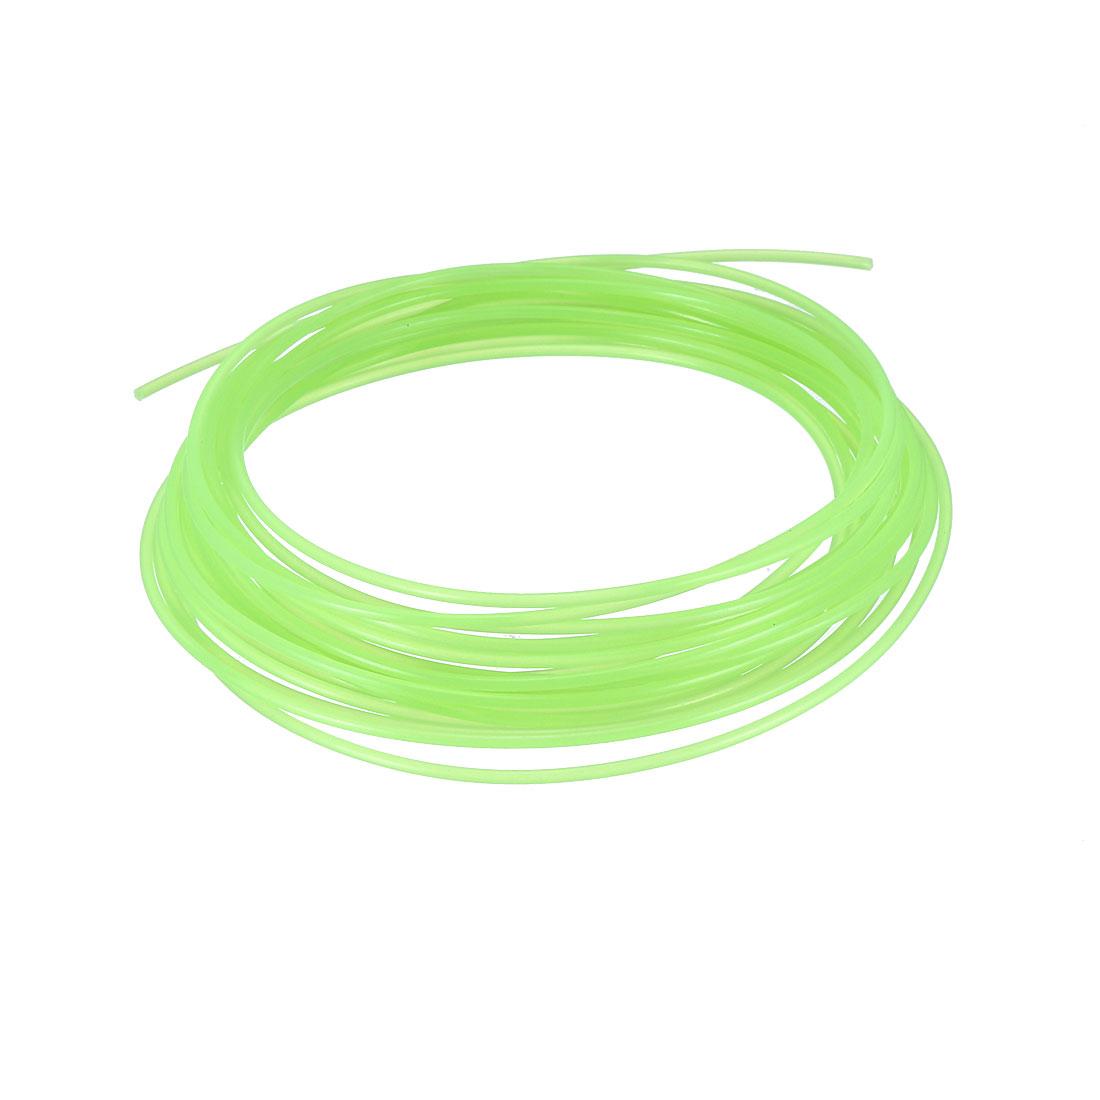 5 Meter/16 Ft PLA 3D Pen/3D Printer Filament, 1.75 mm Fluorescent Green